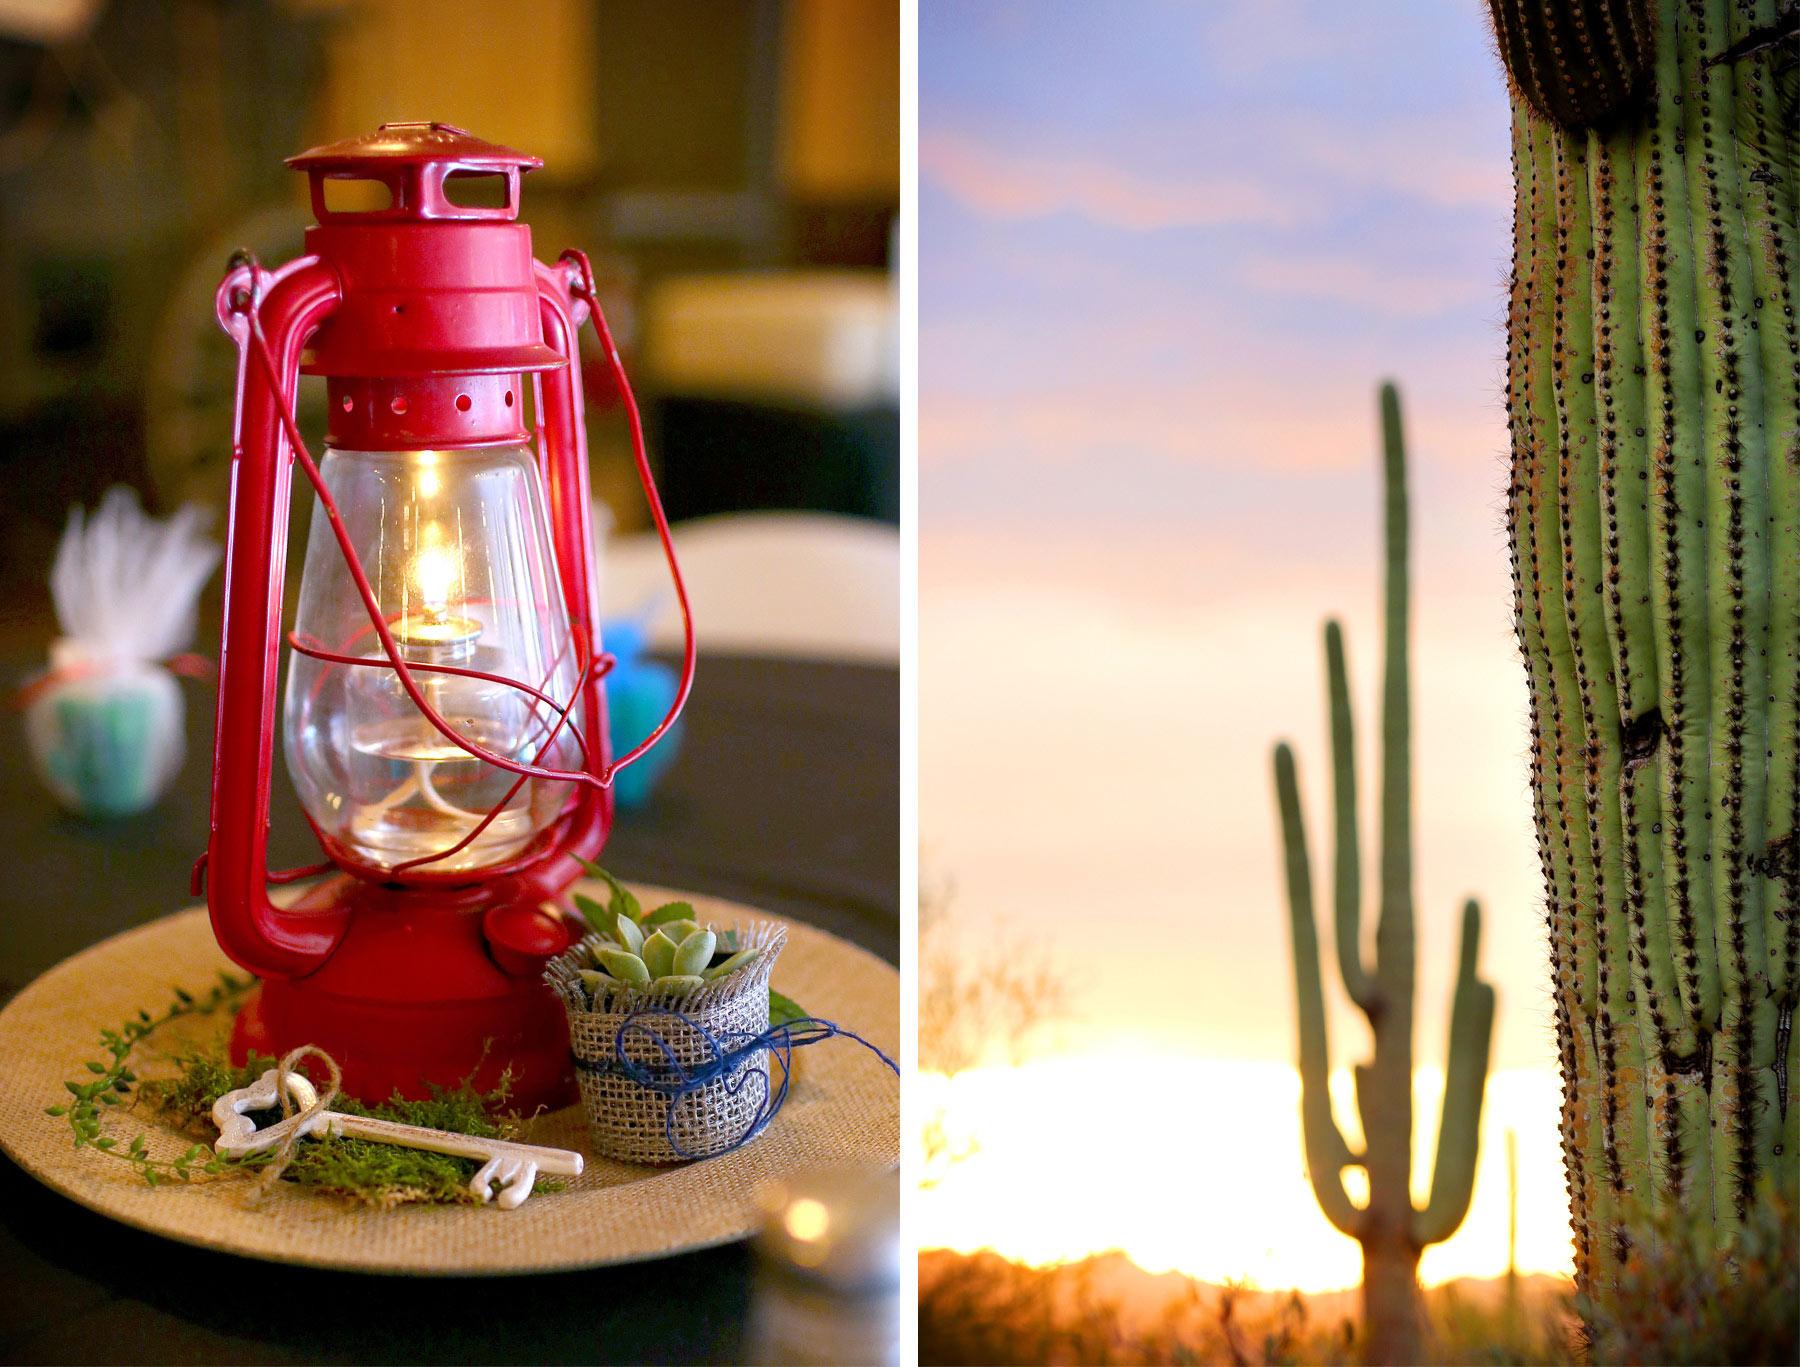 16-Tuscan-Arizona-Wedding-Photography-by-Vick-Photography-Destination-Wedding-Desert-Old-Tucson-Studios-Cactus-Sunset-Lantern-Elsa-and-Arthur.jpg